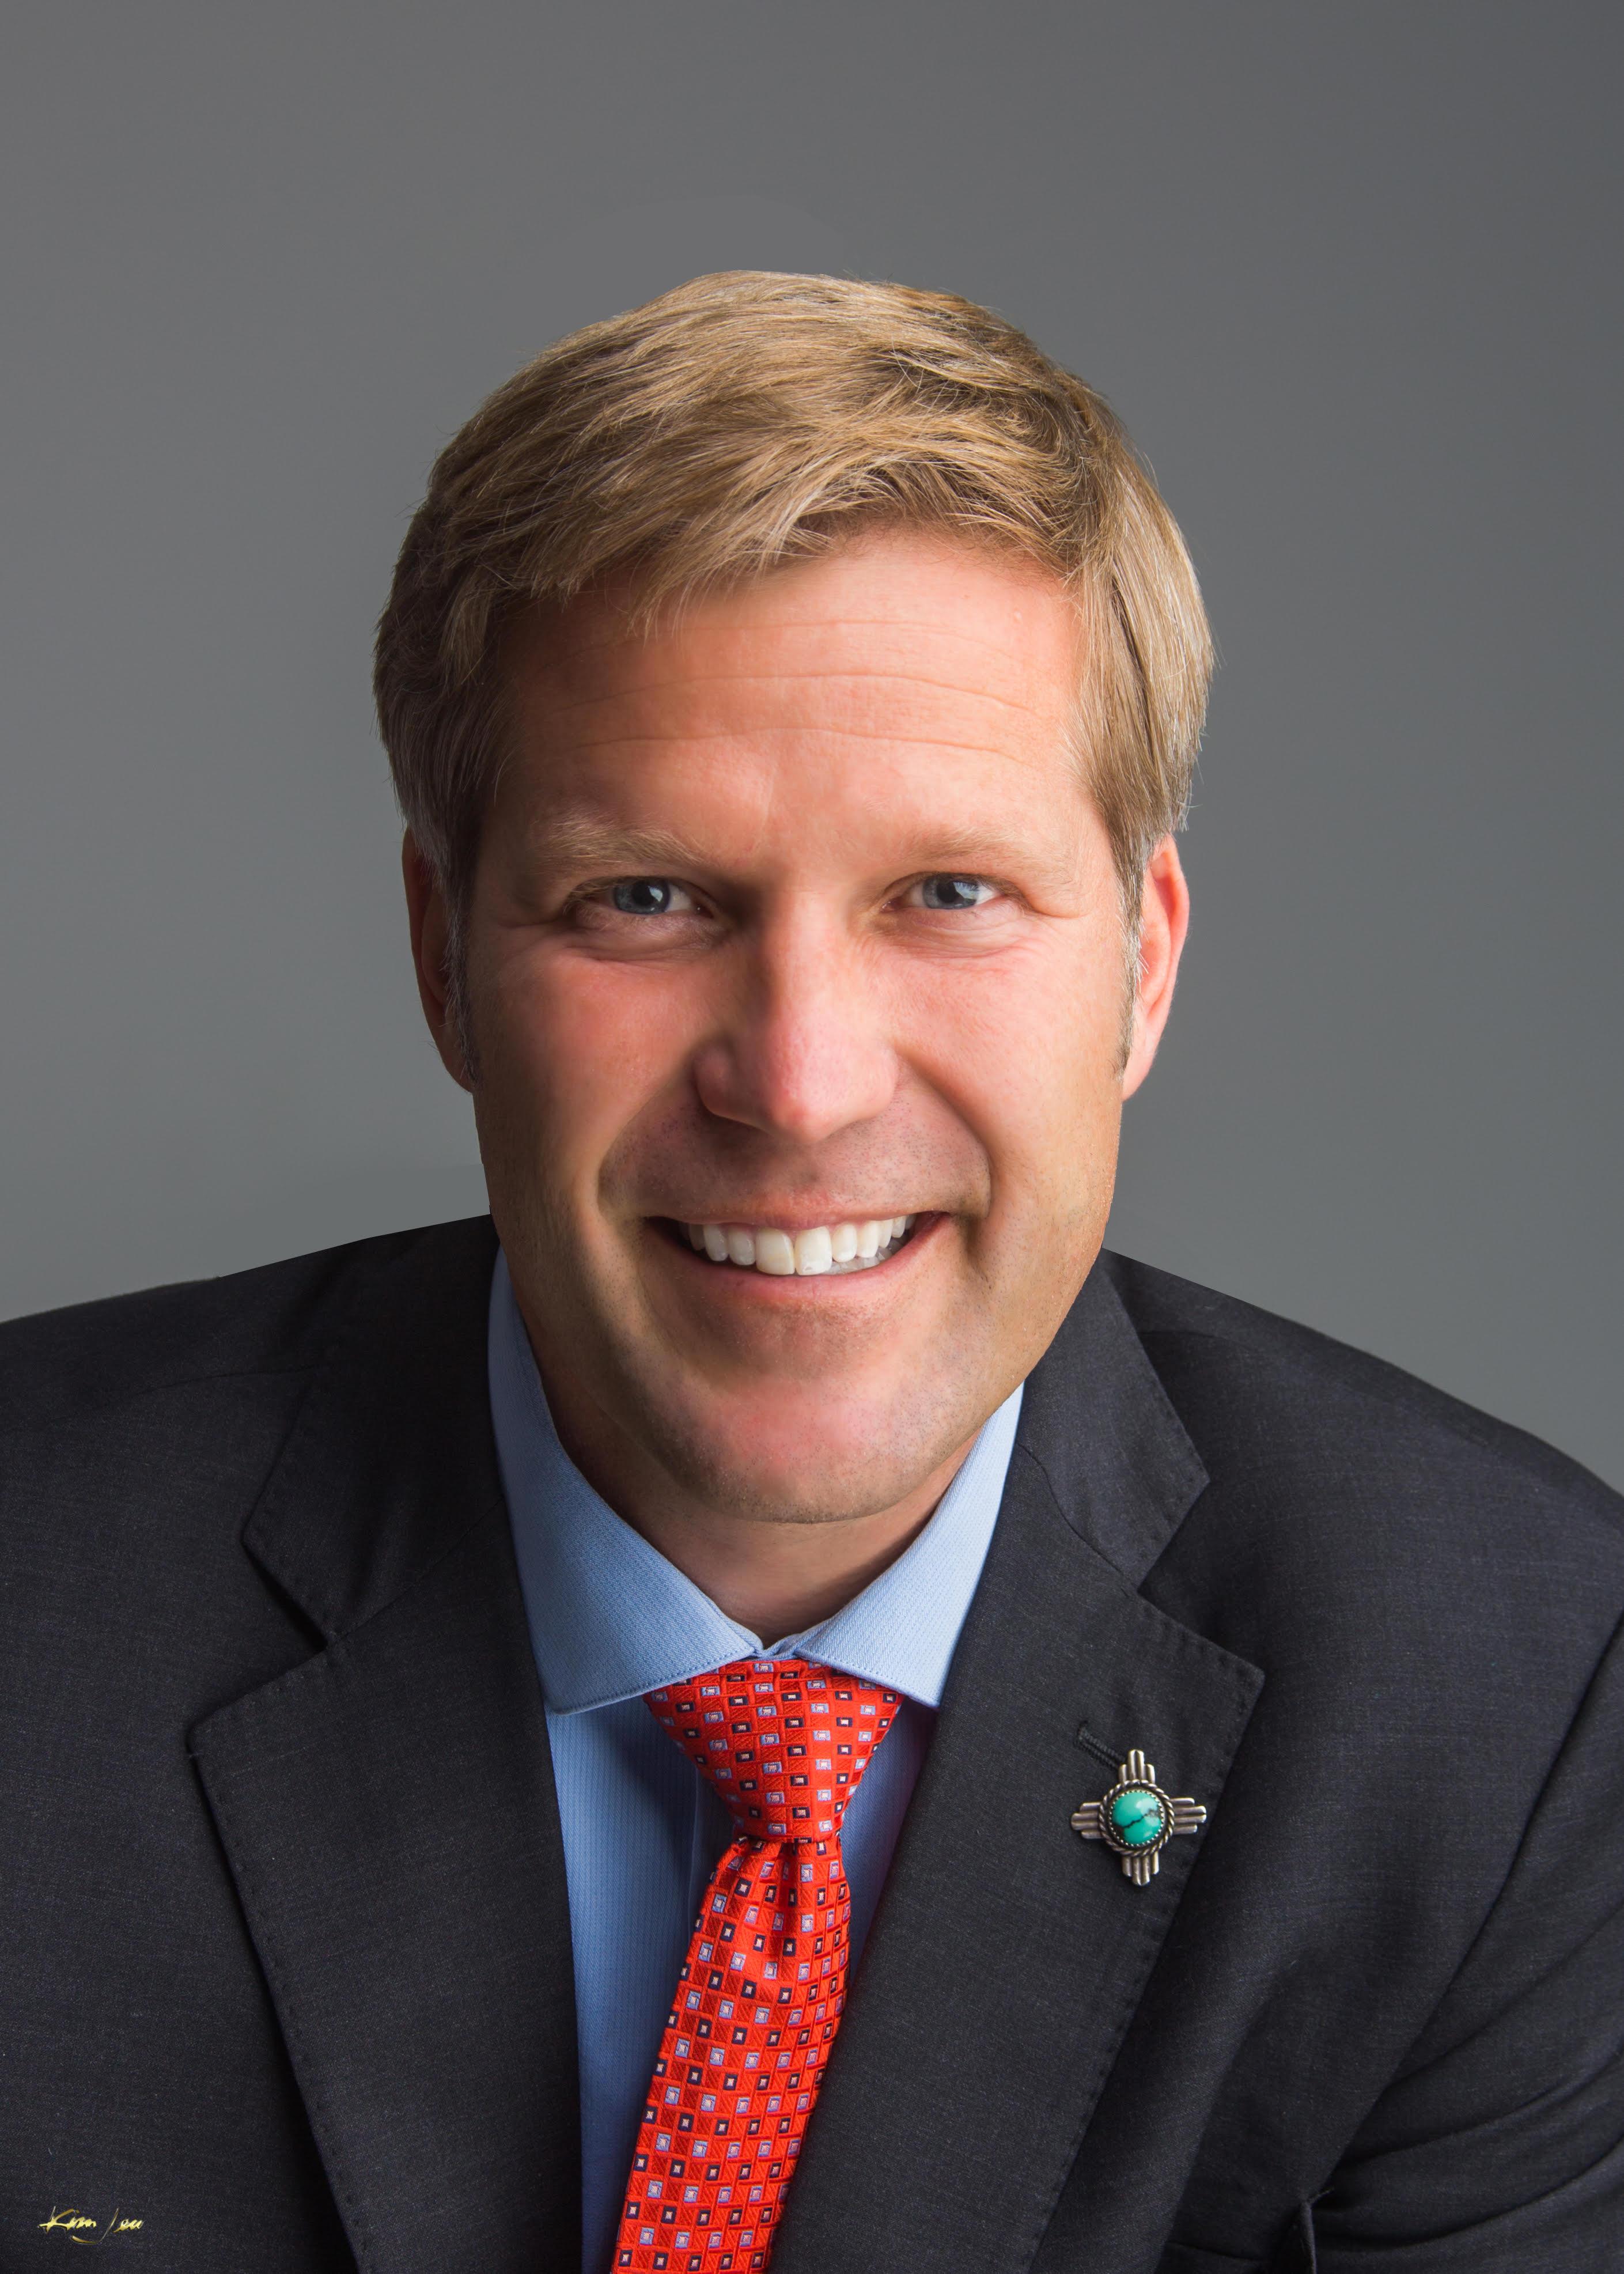 Mayor Tim Keller Head Shot